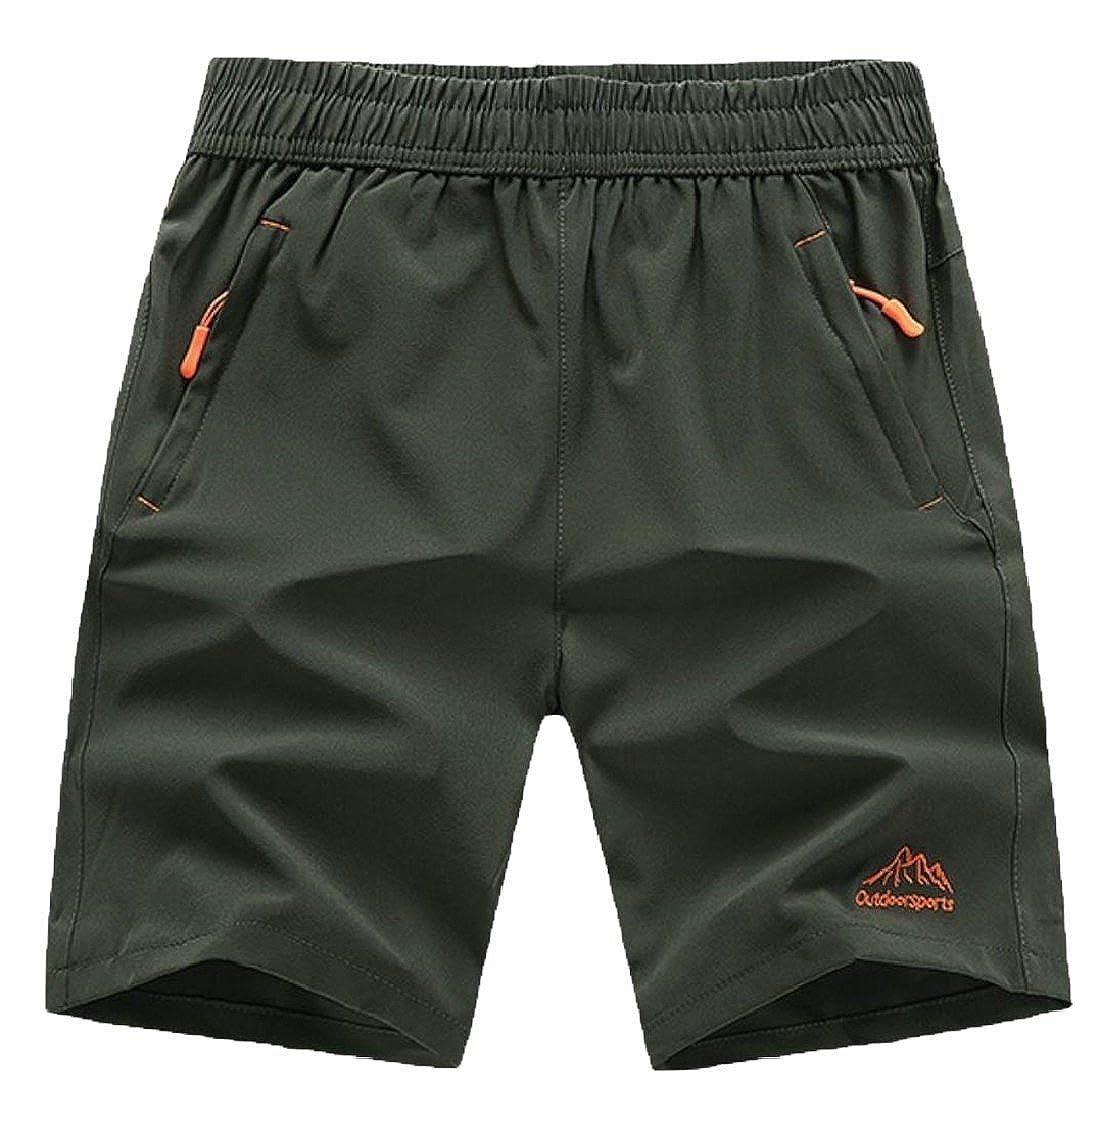 Gocgt Mens Summer Outdoor Quick Dry Sports Shorts with Zipper Pockets Short Pants